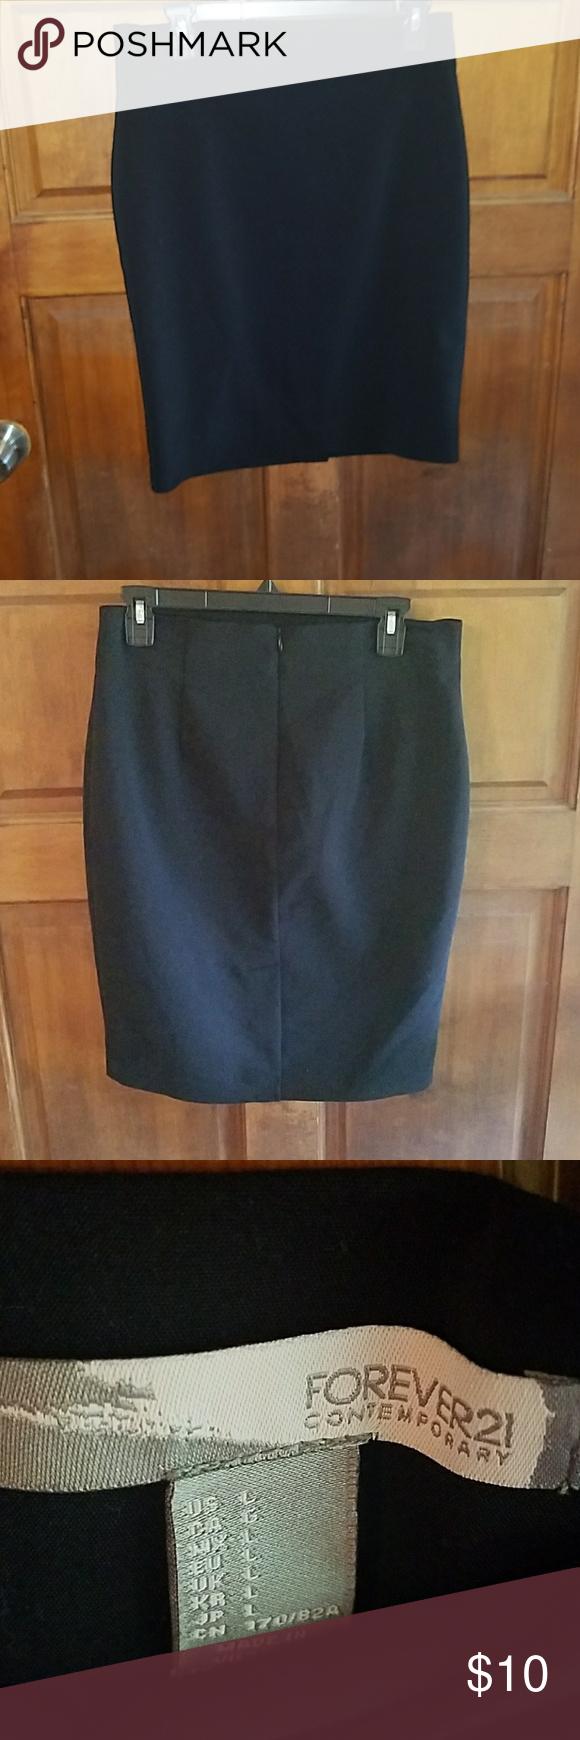 Pencil skirt Black pencil skirt Forever 21 Skirts Pencil